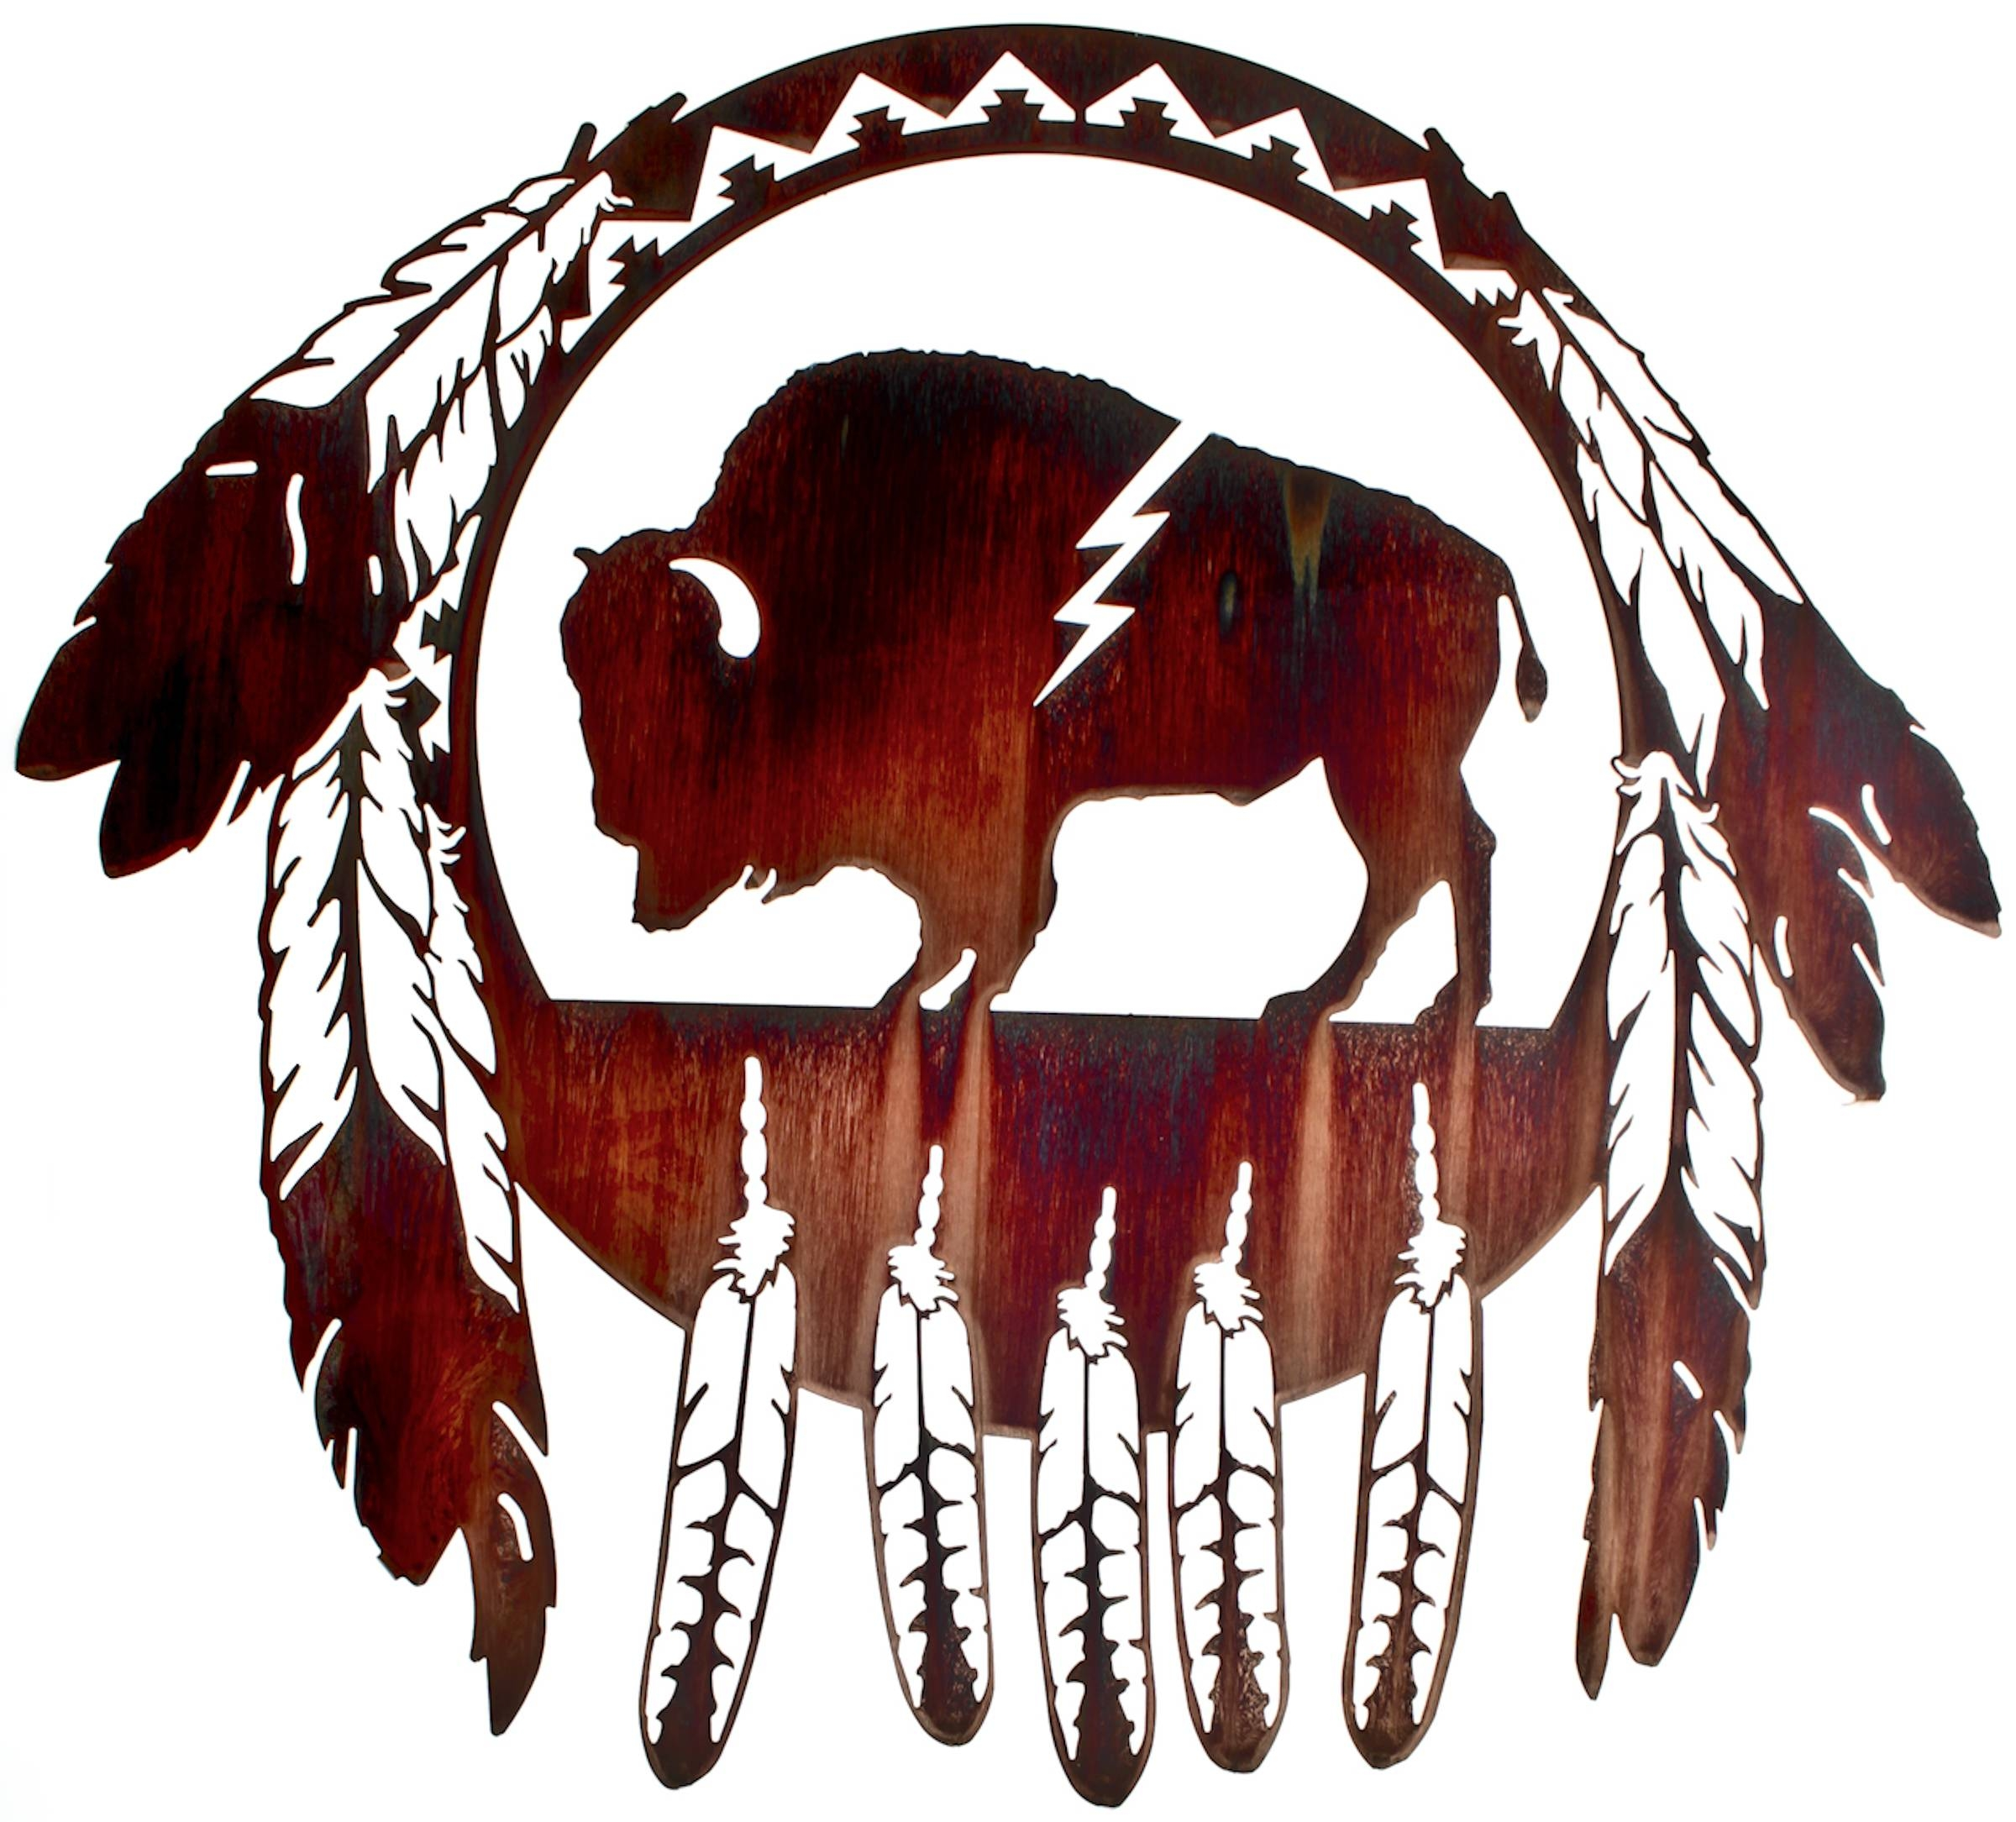 Buffalo Wall Art, Buffalo Wall Hangings, Metal Wall Sculptures Regarding Newest Native American Metal Wall Art (View 3 of 20)